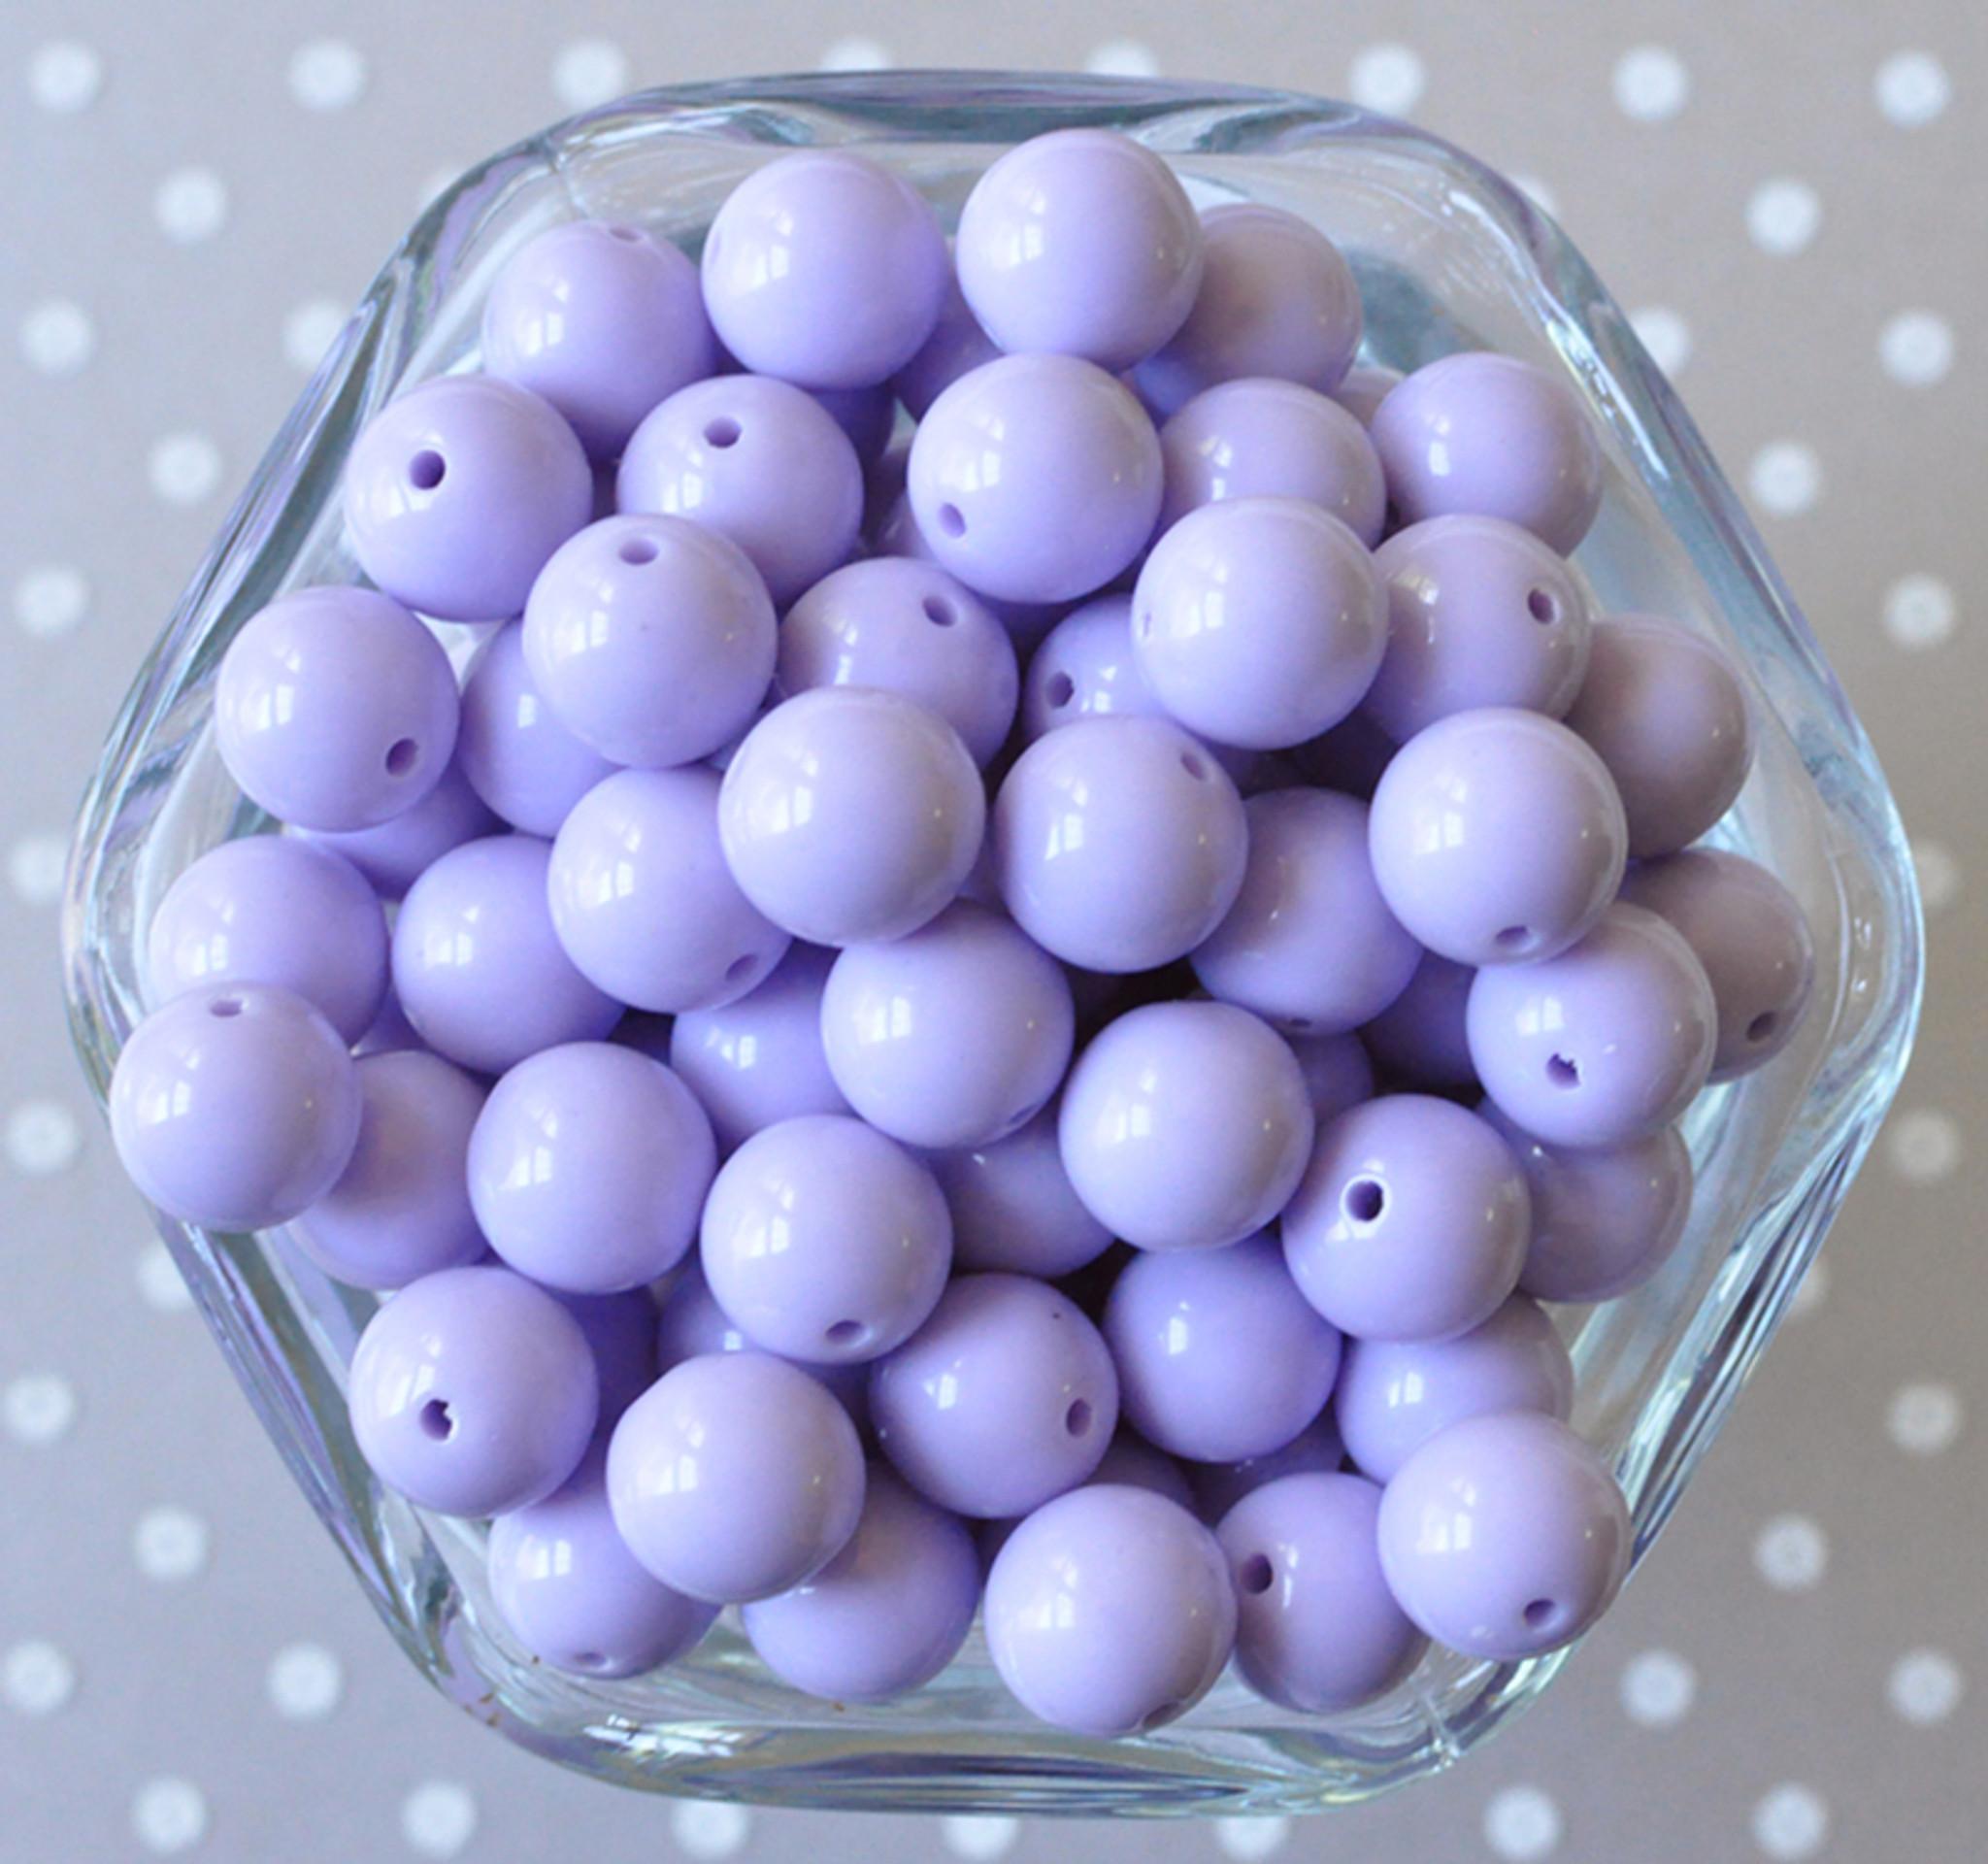 12mm Lavender solid bubblegum beads